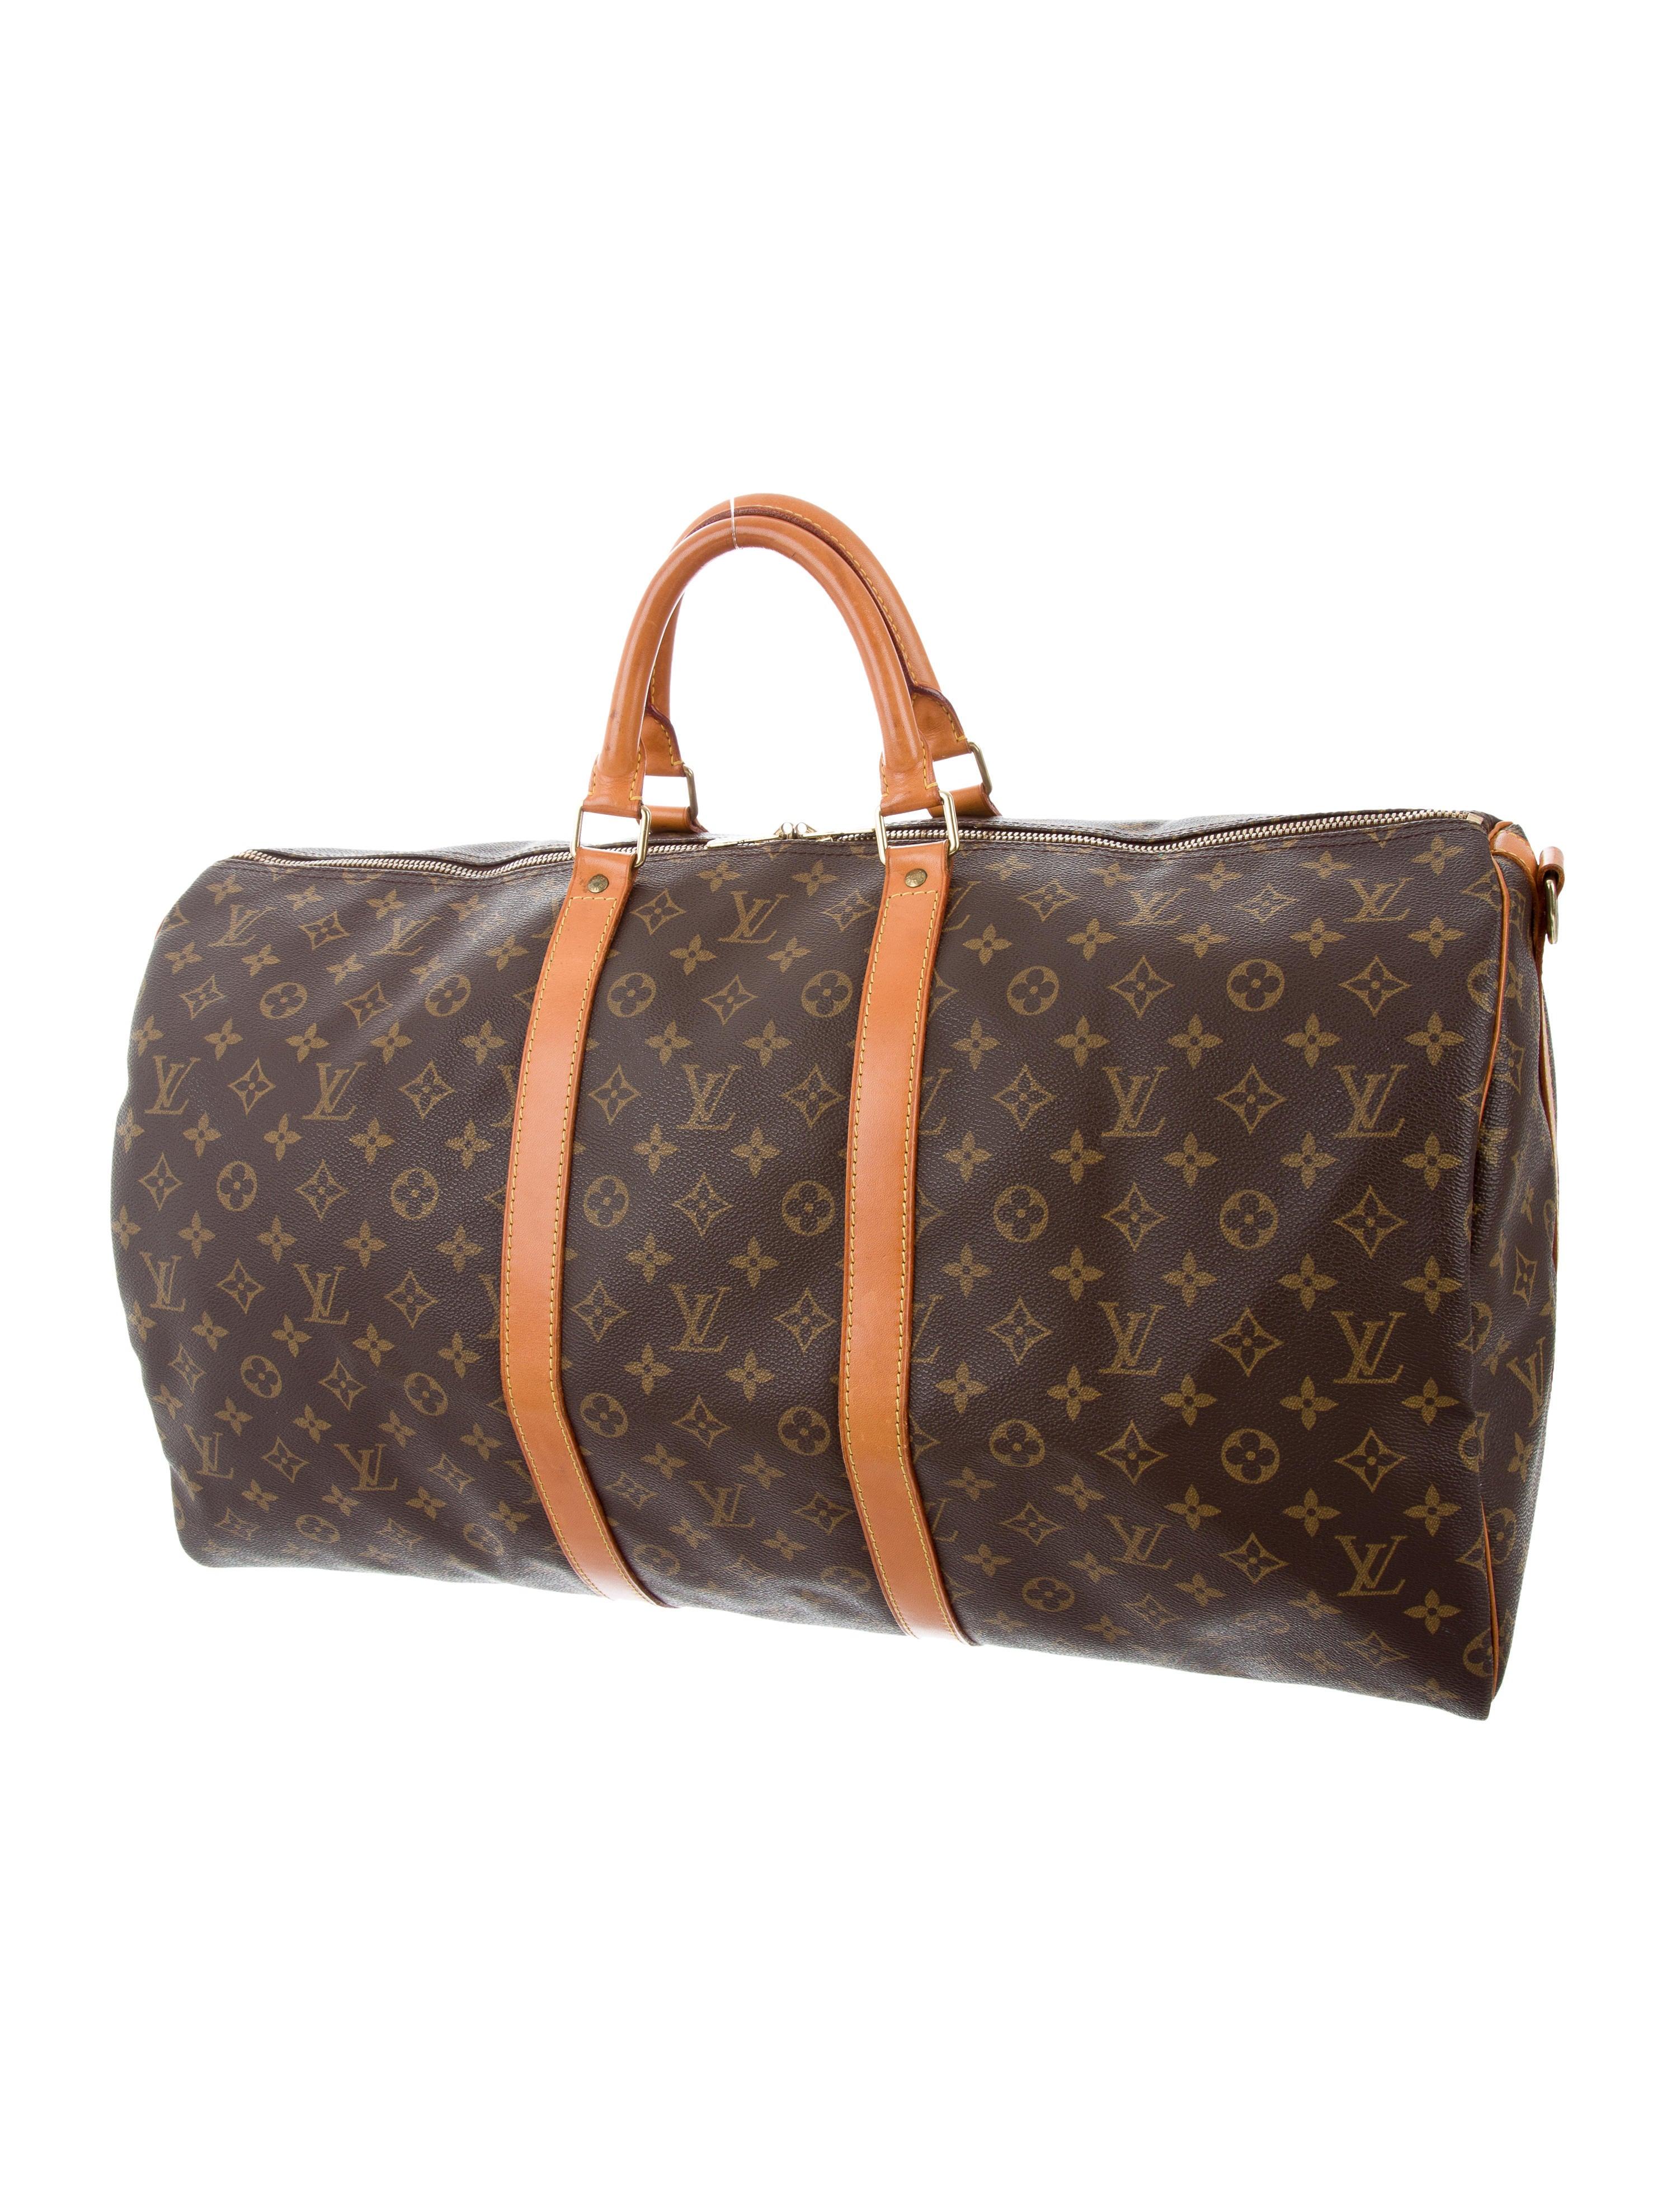 louis vuitton monogram keepall bandouli re 55 bags lou122213 the realreal. Black Bedroom Furniture Sets. Home Design Ideas